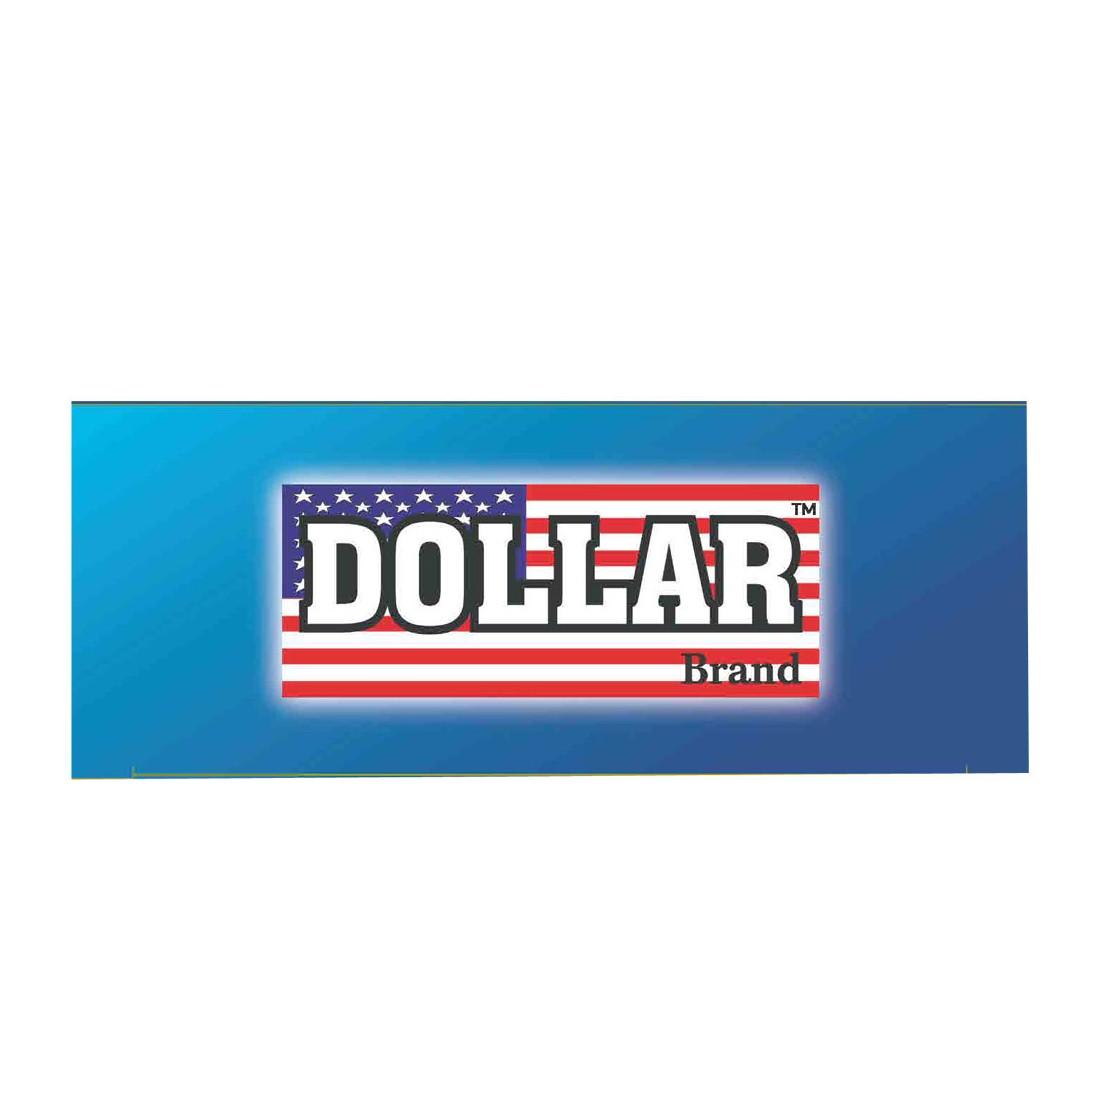 Dollar Brand Selected Walnut Kernels of kashmir 1 Kg -250g X 4